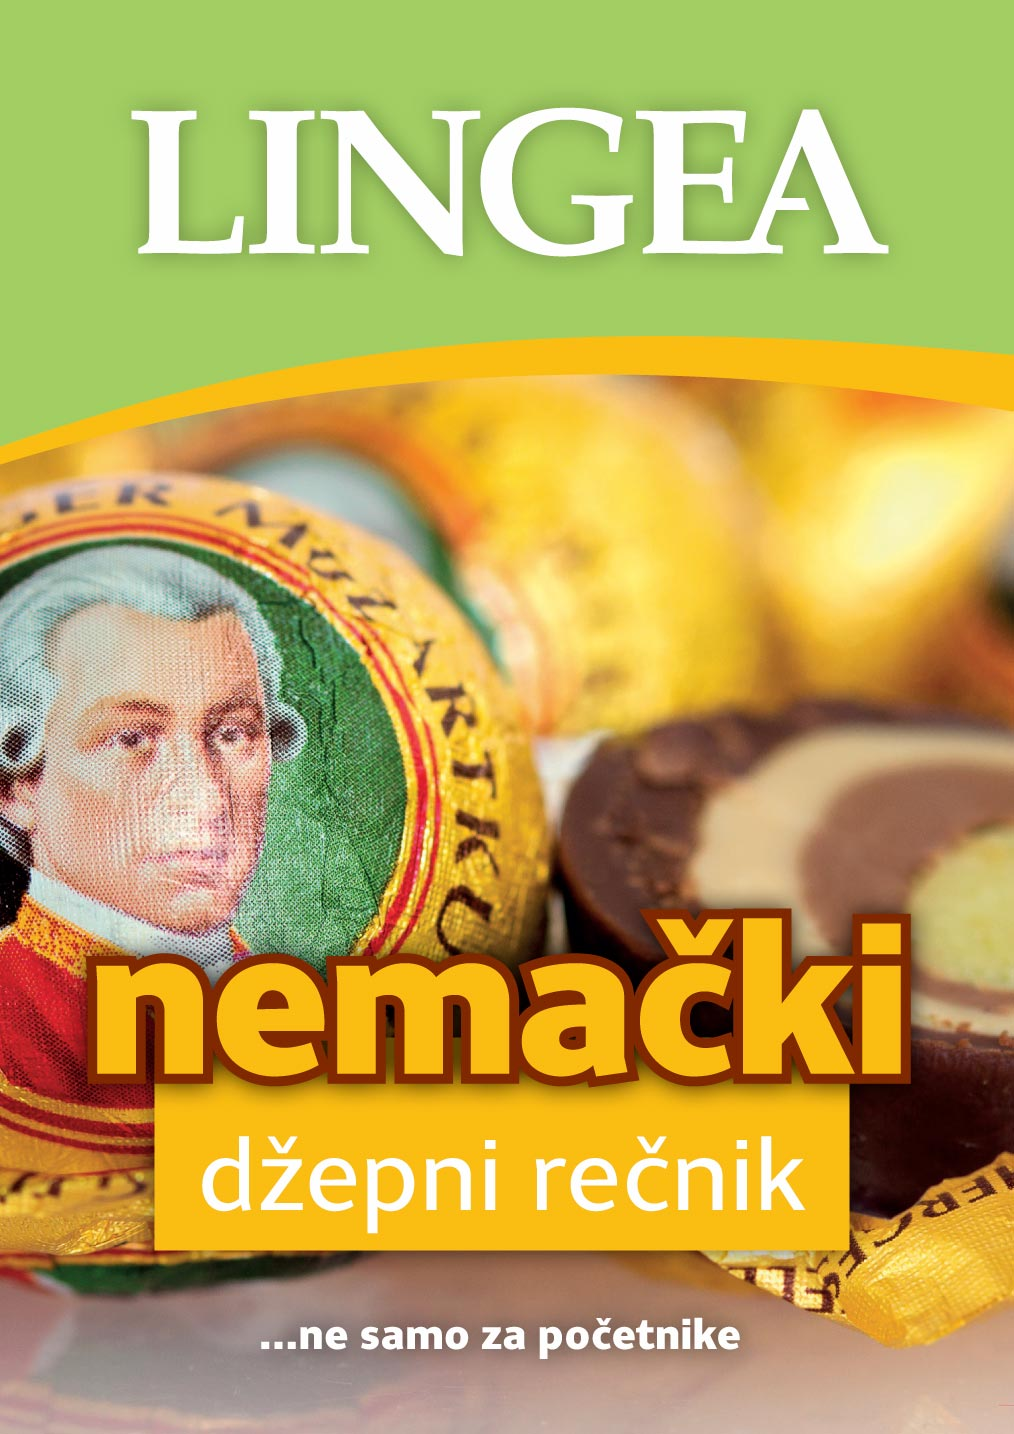 Nemački - džepni rečnik, 2. izdanje